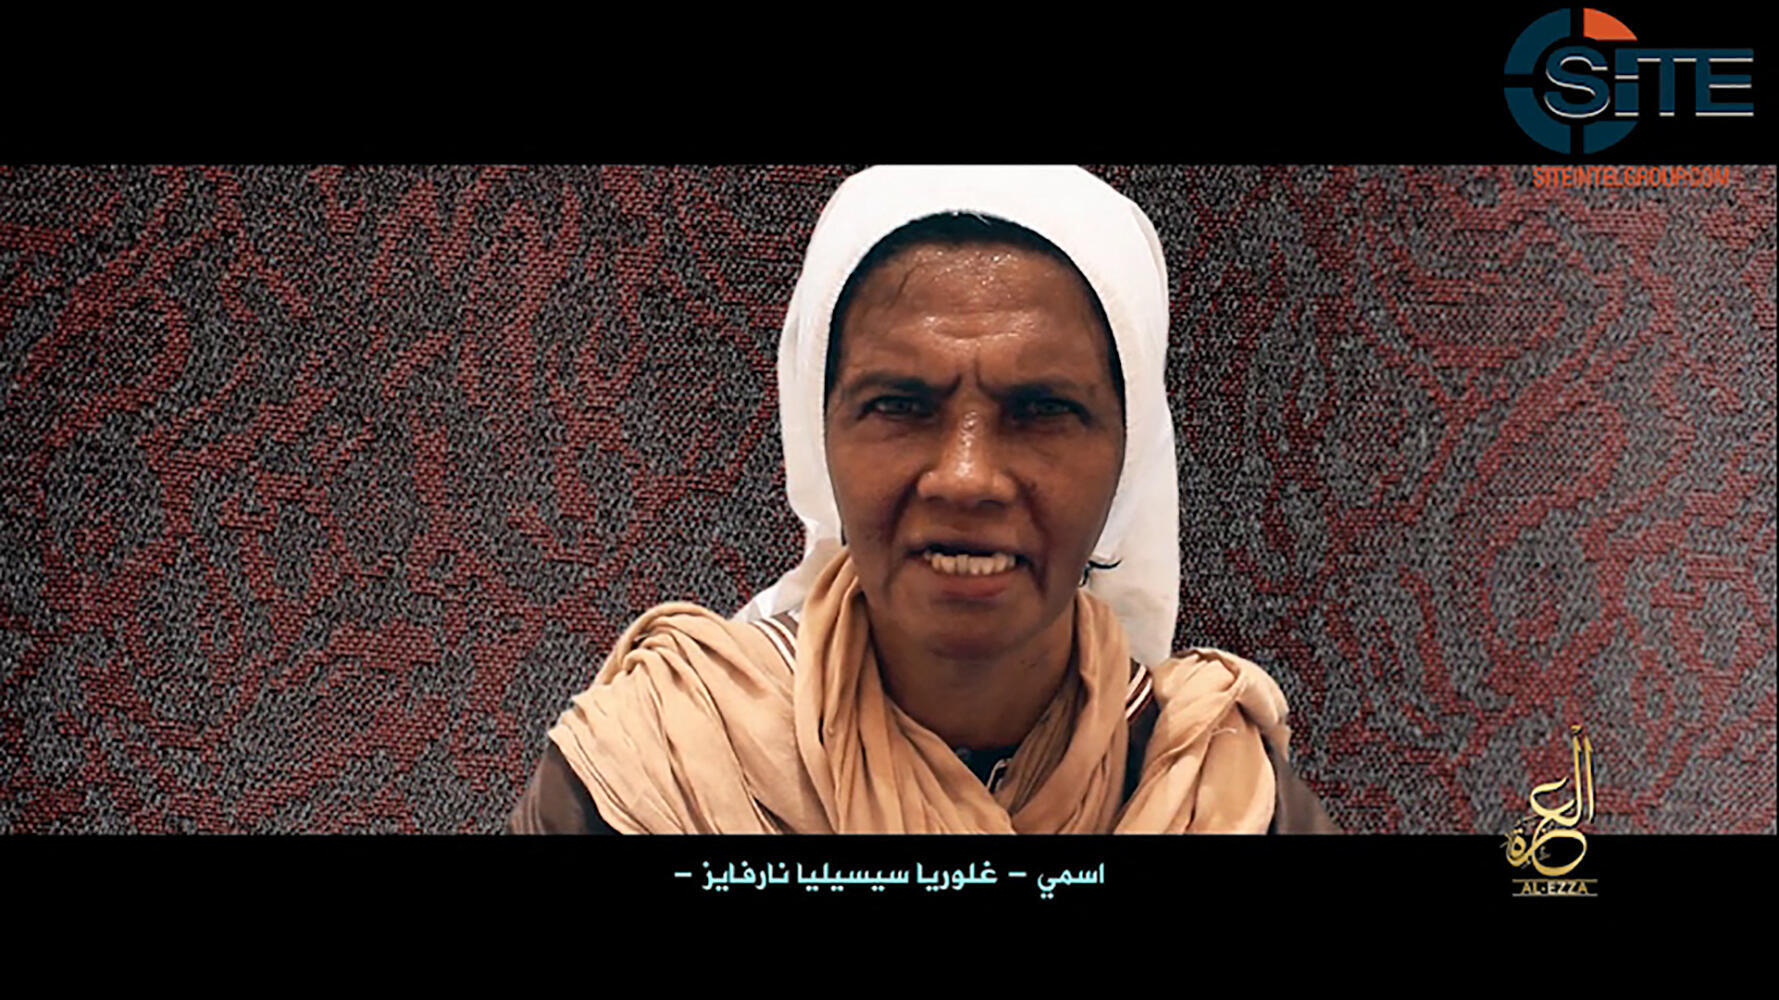 000_9PF2MH Mali libération soeur Gloria Cecilia enlevée en 2017